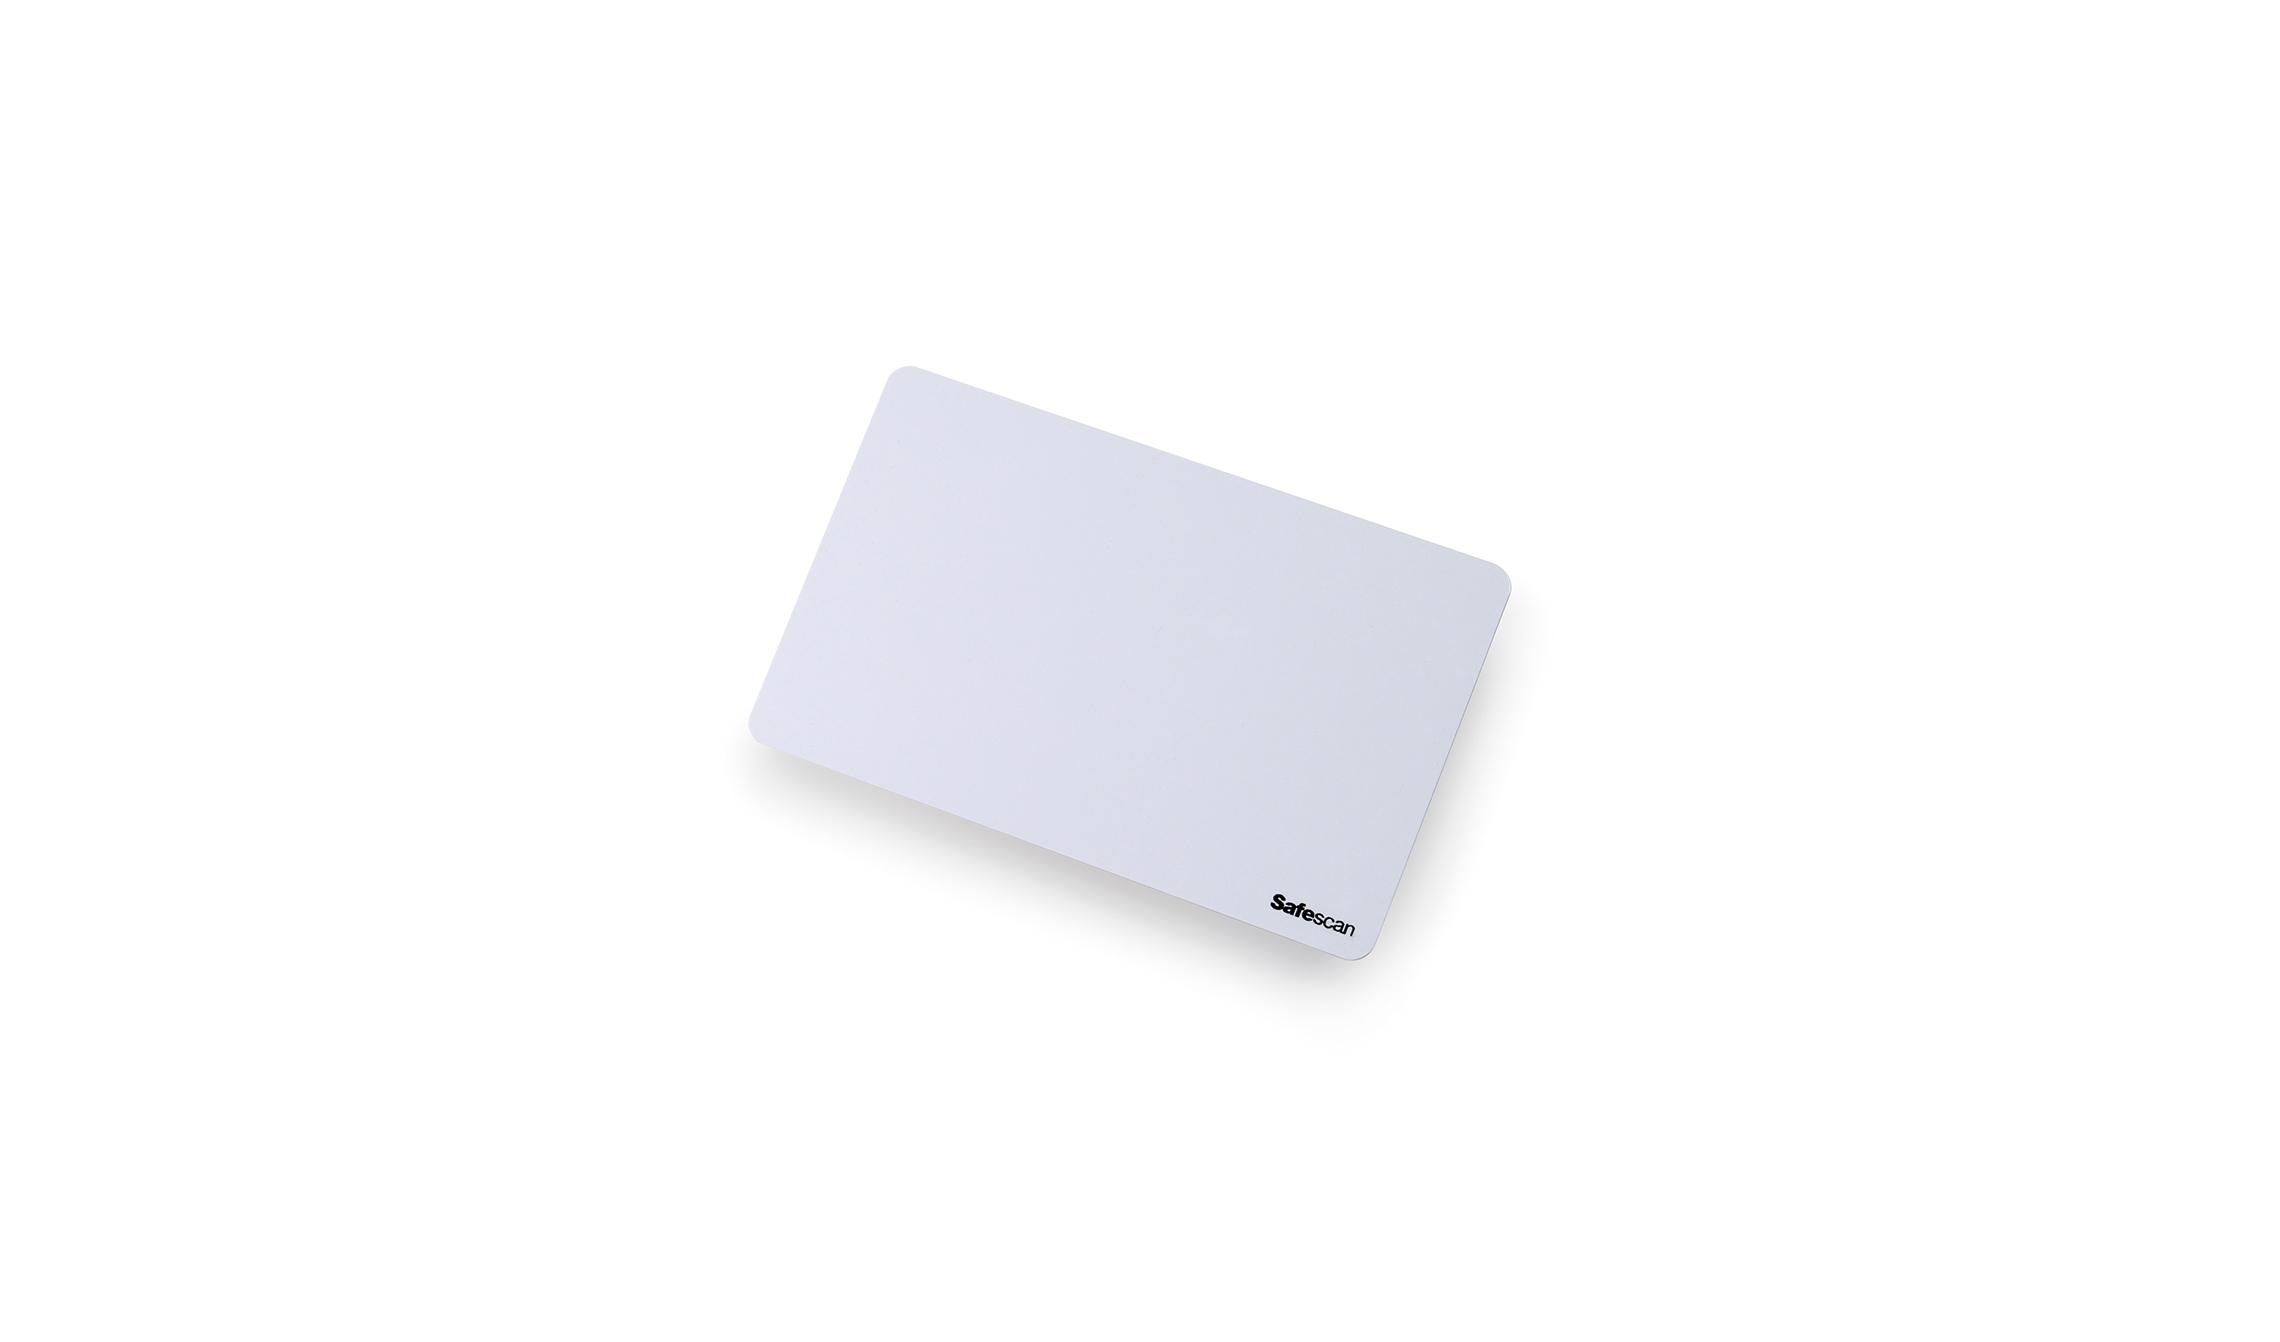 safescan-rf-100-proximity-card